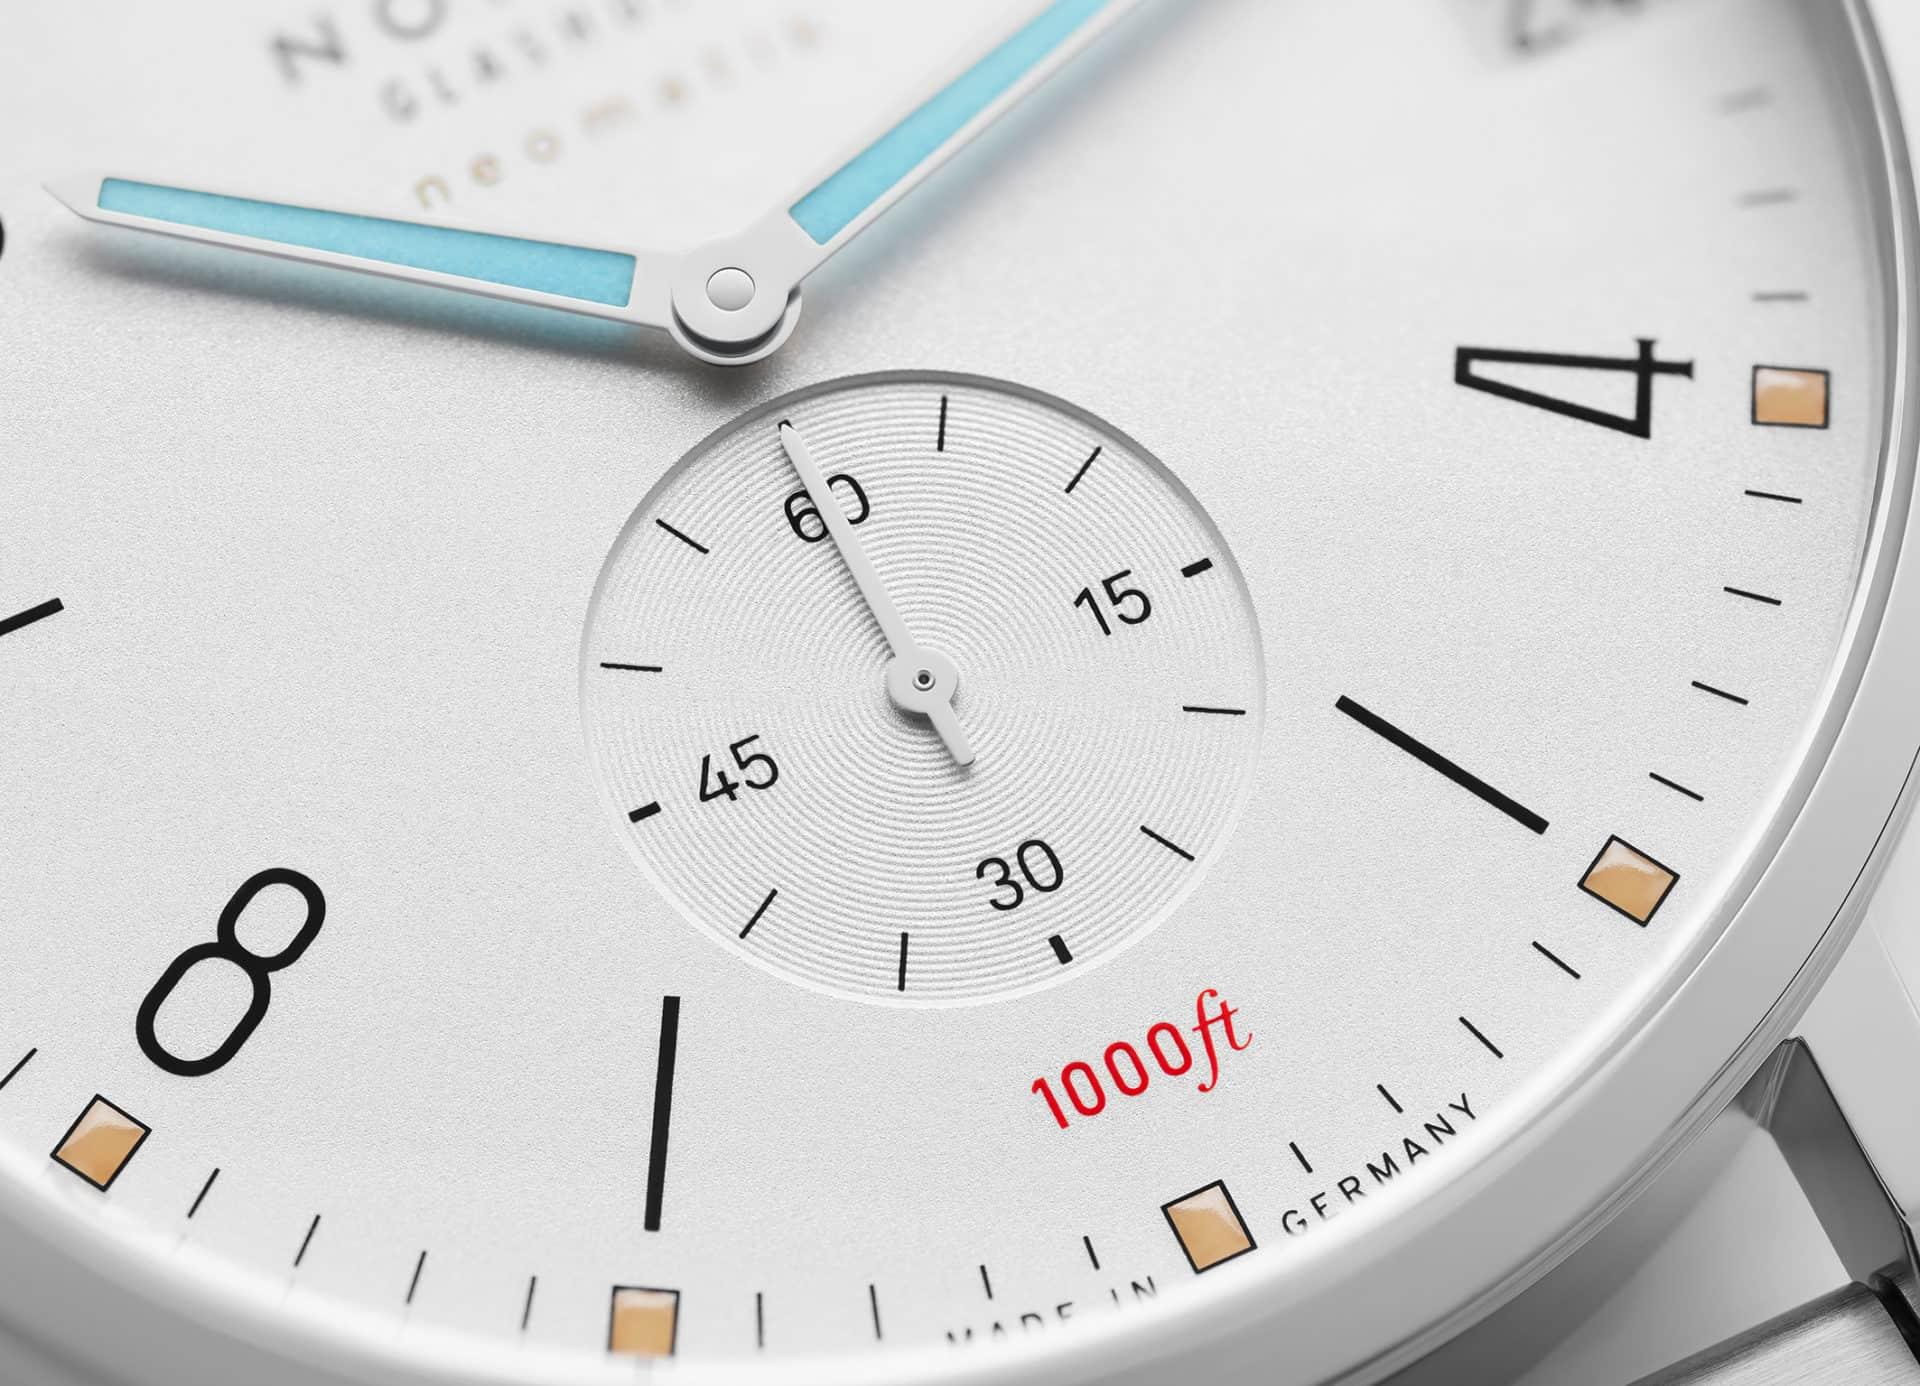 008_NOMOS_Tangente_Sport_neomatik_42_date_detail_dial